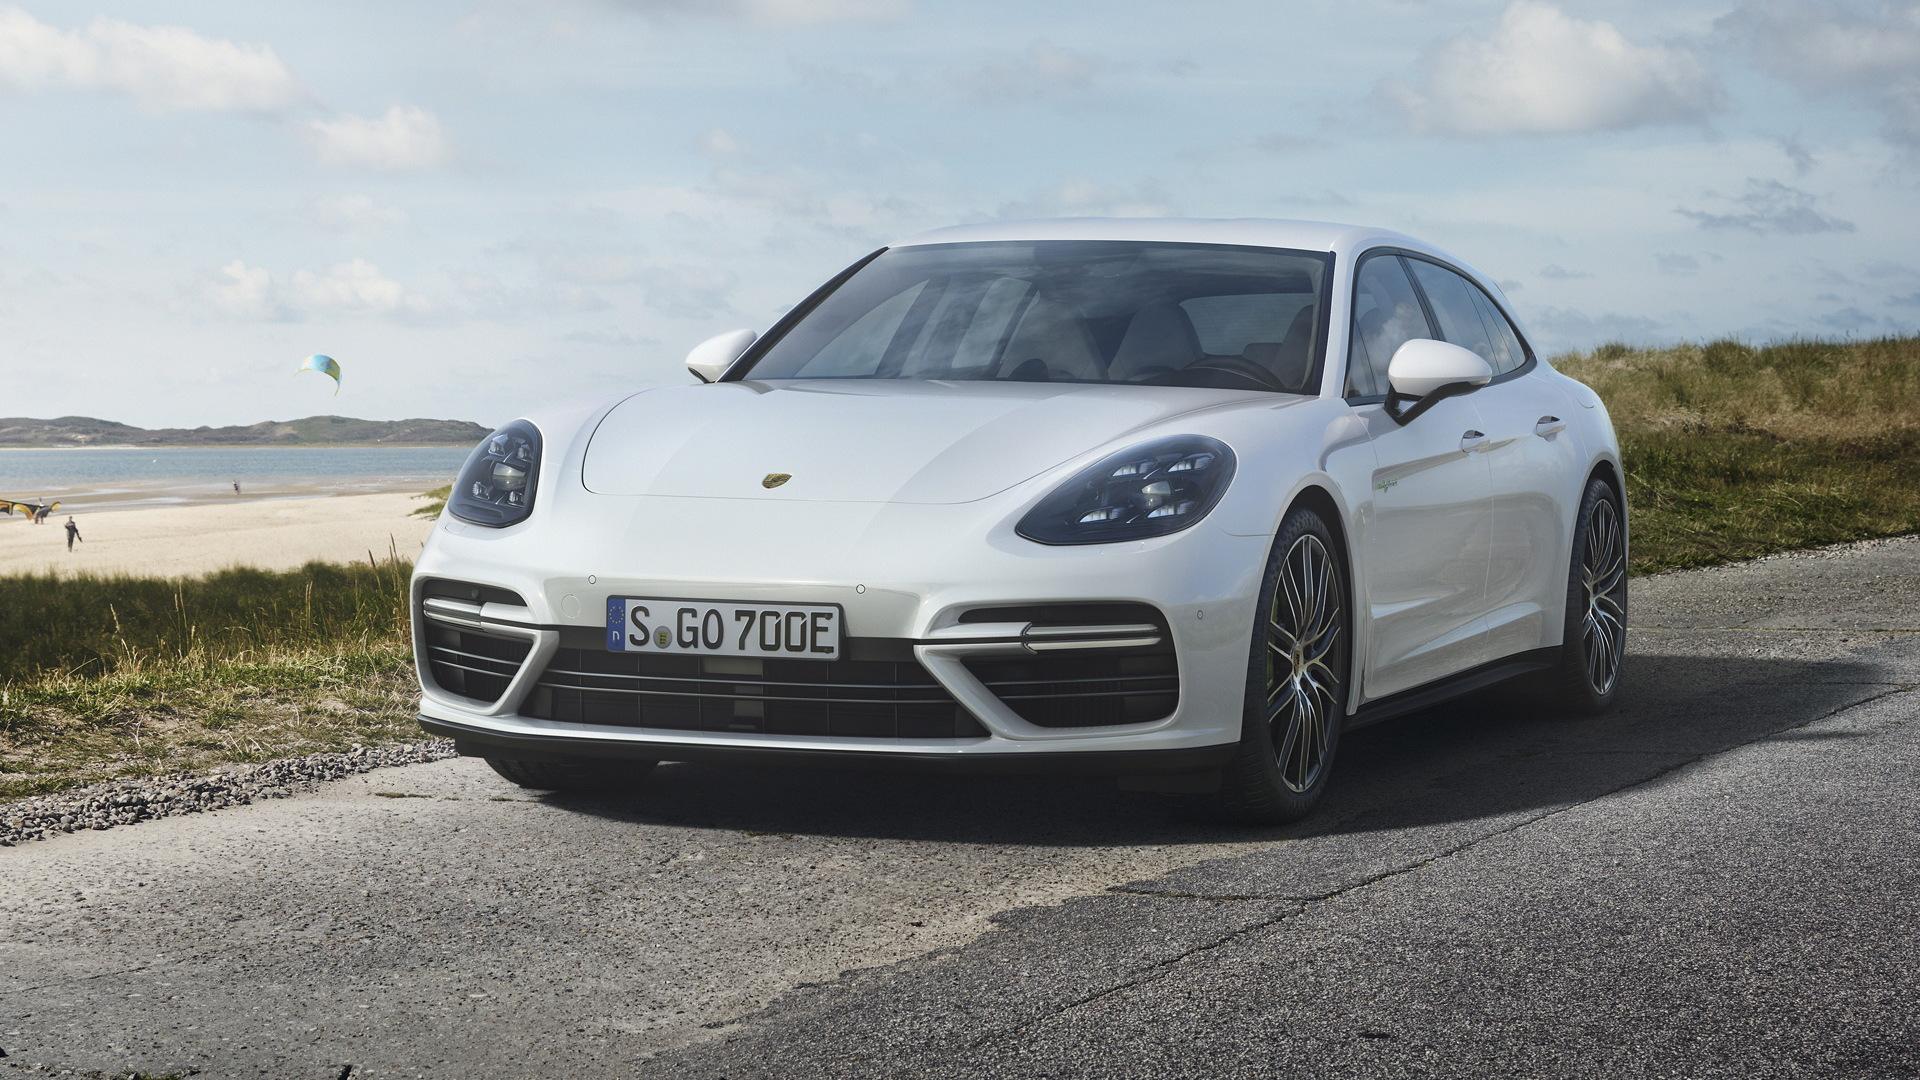 2018 Porsche Panamera Turbo S E-Hybrid Sport Turismo